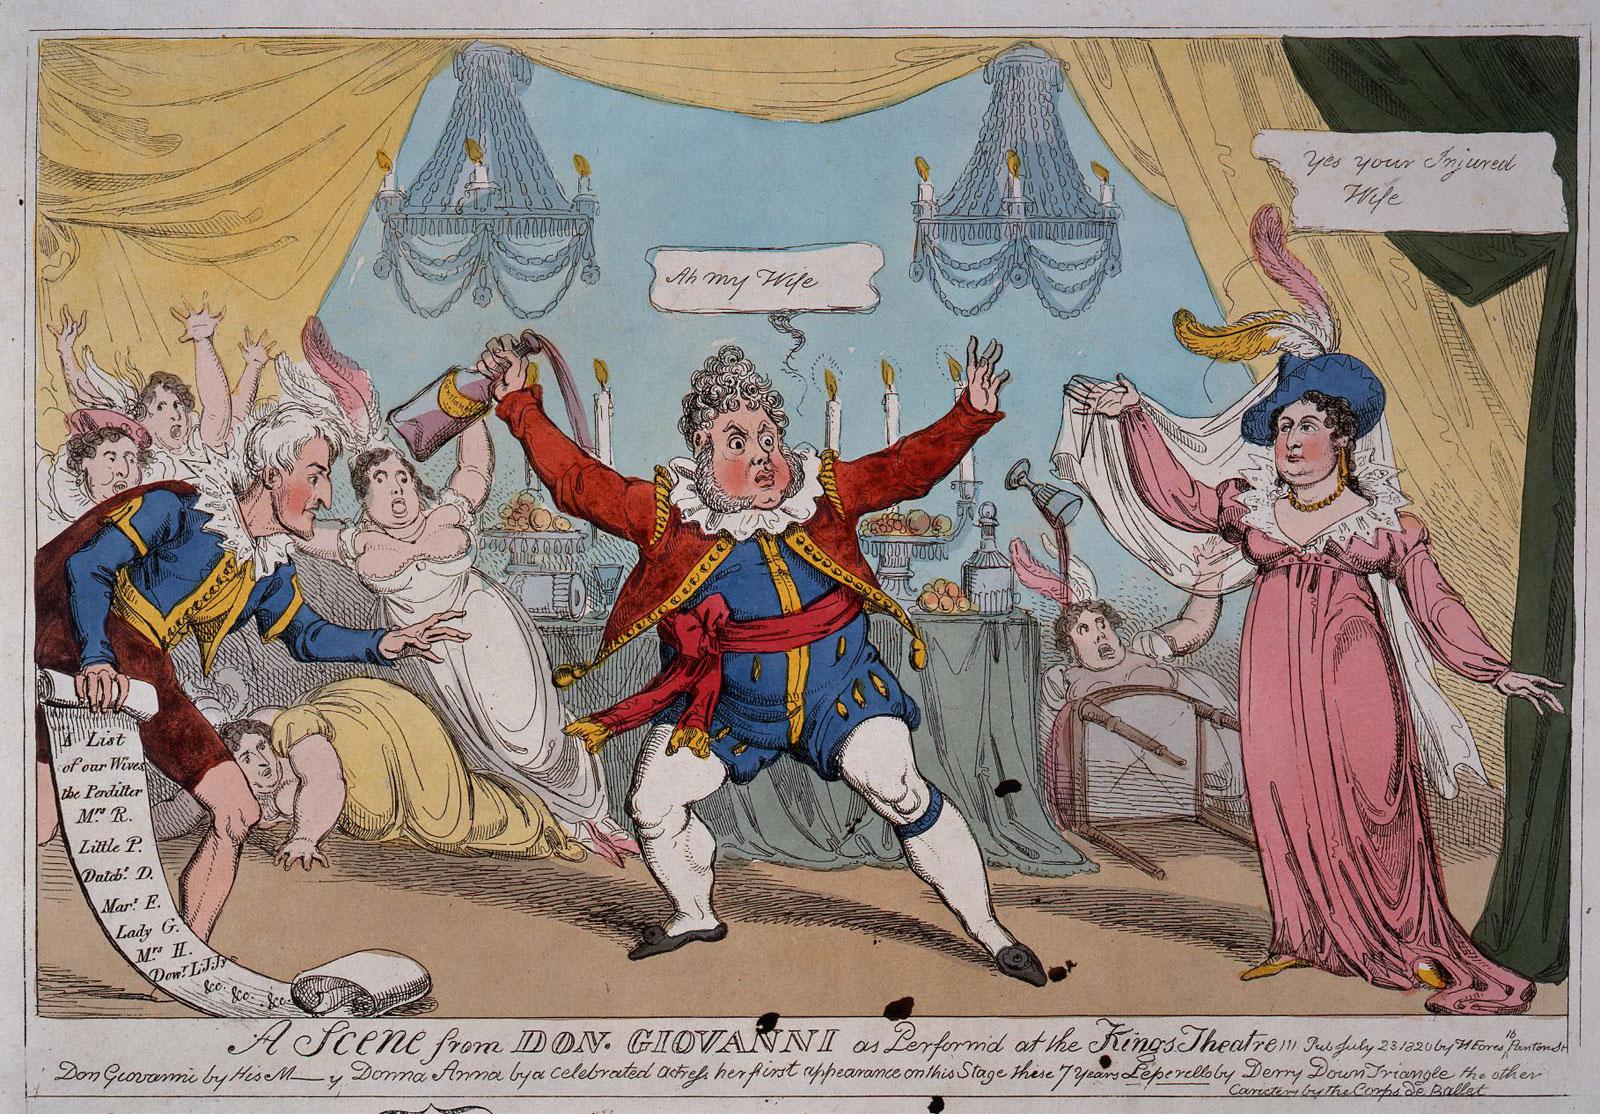 Cartoon supporting Queen Caroline (TS 11/115/326 (41))